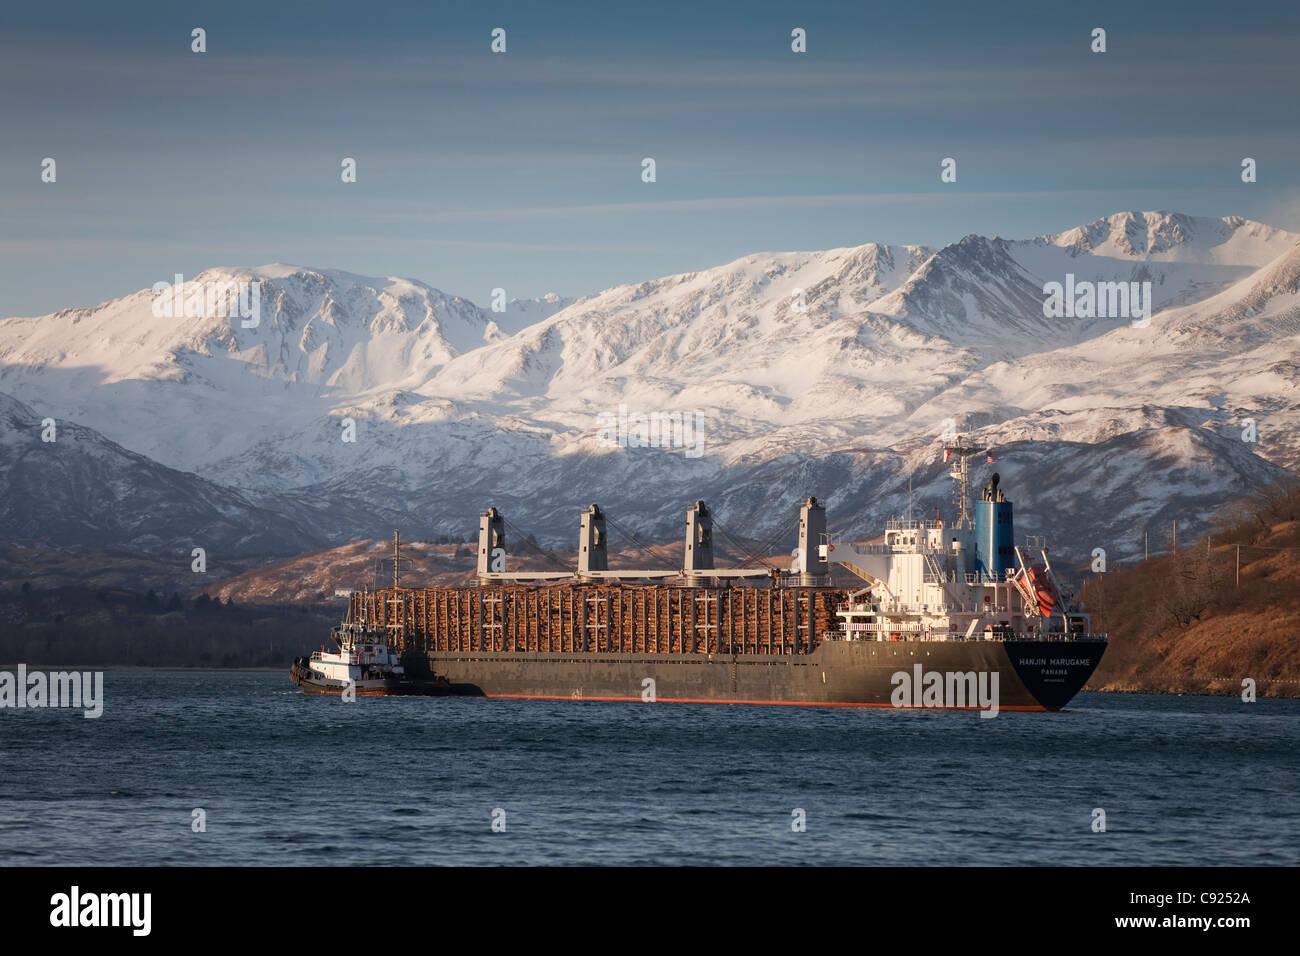 Panamanian ship Hanjin Marugame, assisted by a tug boat, departs Womens Bay, Kodiak Island, Southwest Alaska, Autumn - Stock Image